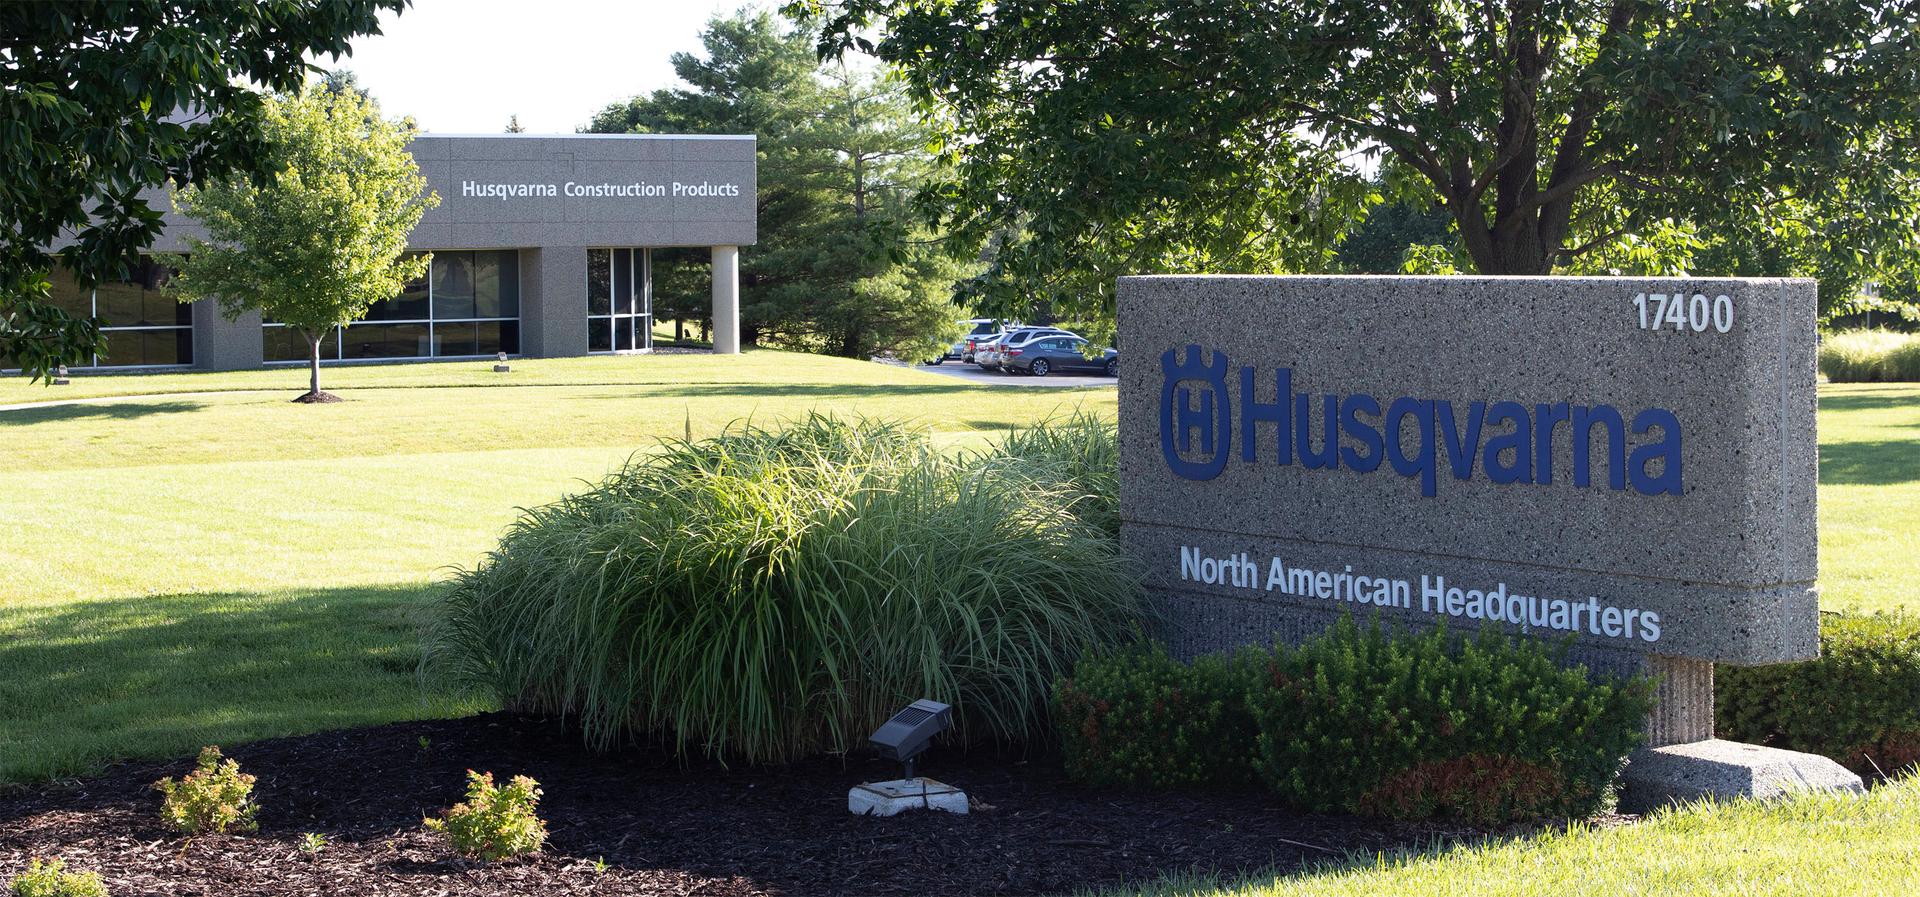 Husqvarna Headquartersphoto